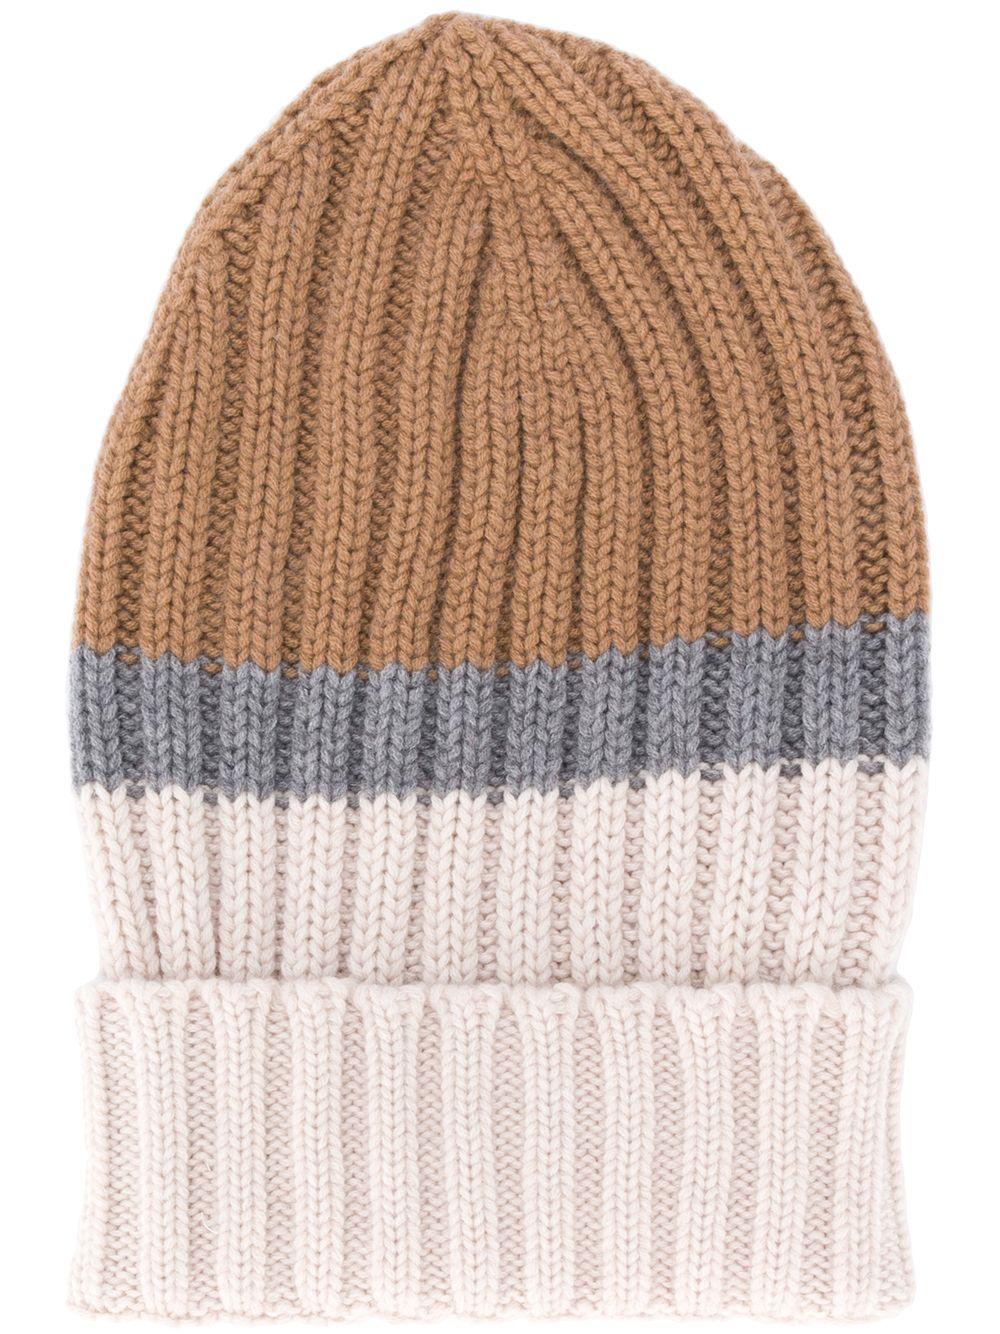 multicolored chuncky ribbed knit wool beanie hat ELEVENTY |  | B76CLPB02-MAG0B00504-14